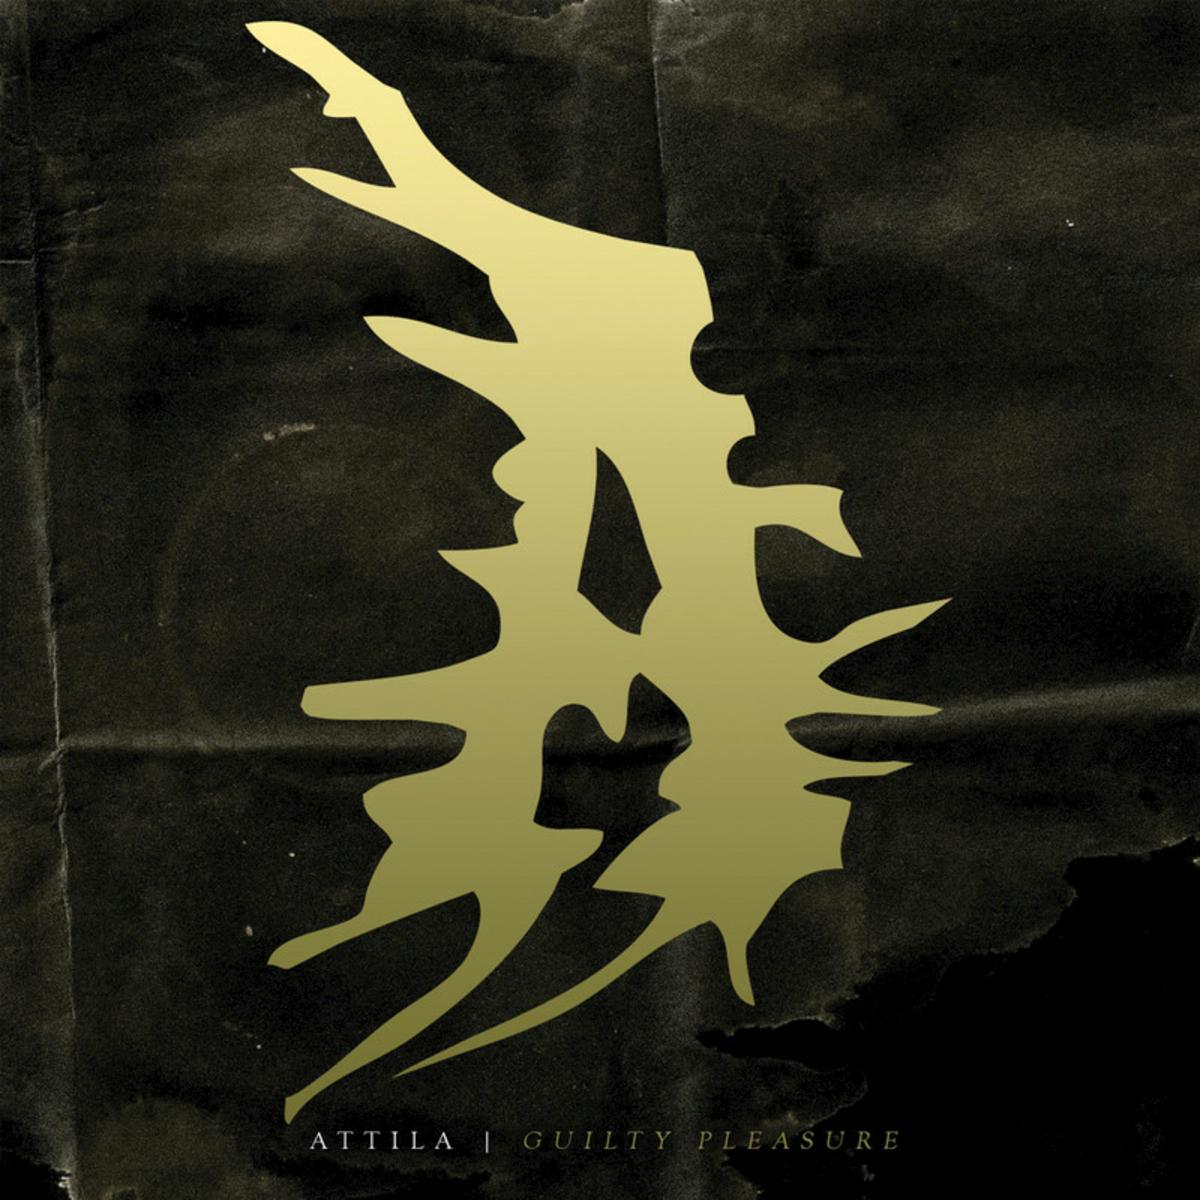 Attila - Guilty Pleasure (2014)